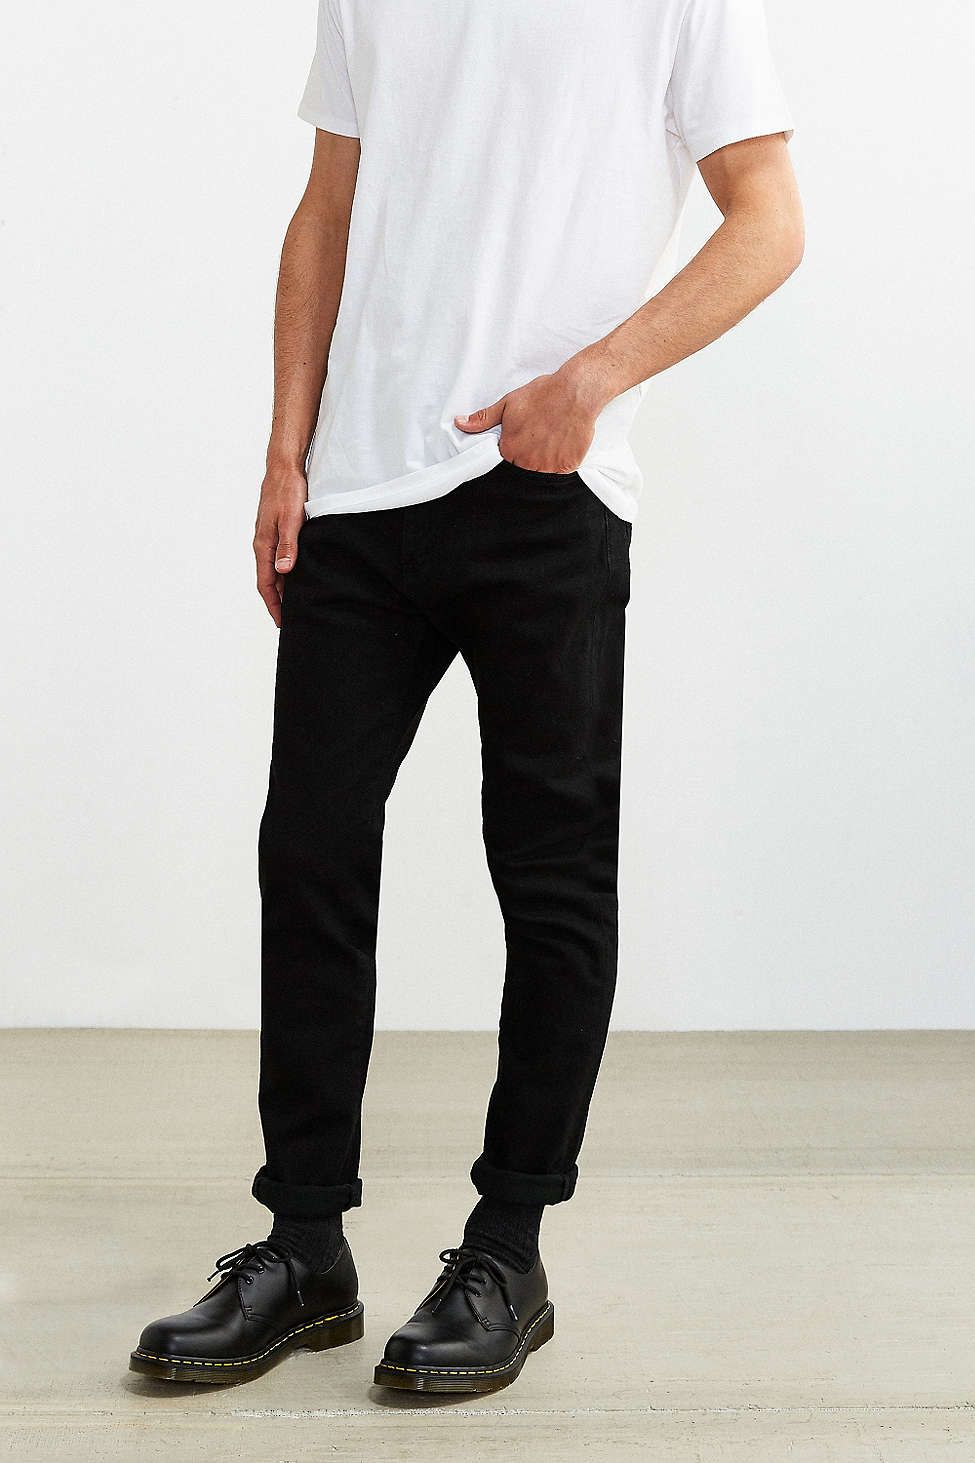 Levi's 510 Nightshine Skinny Jean